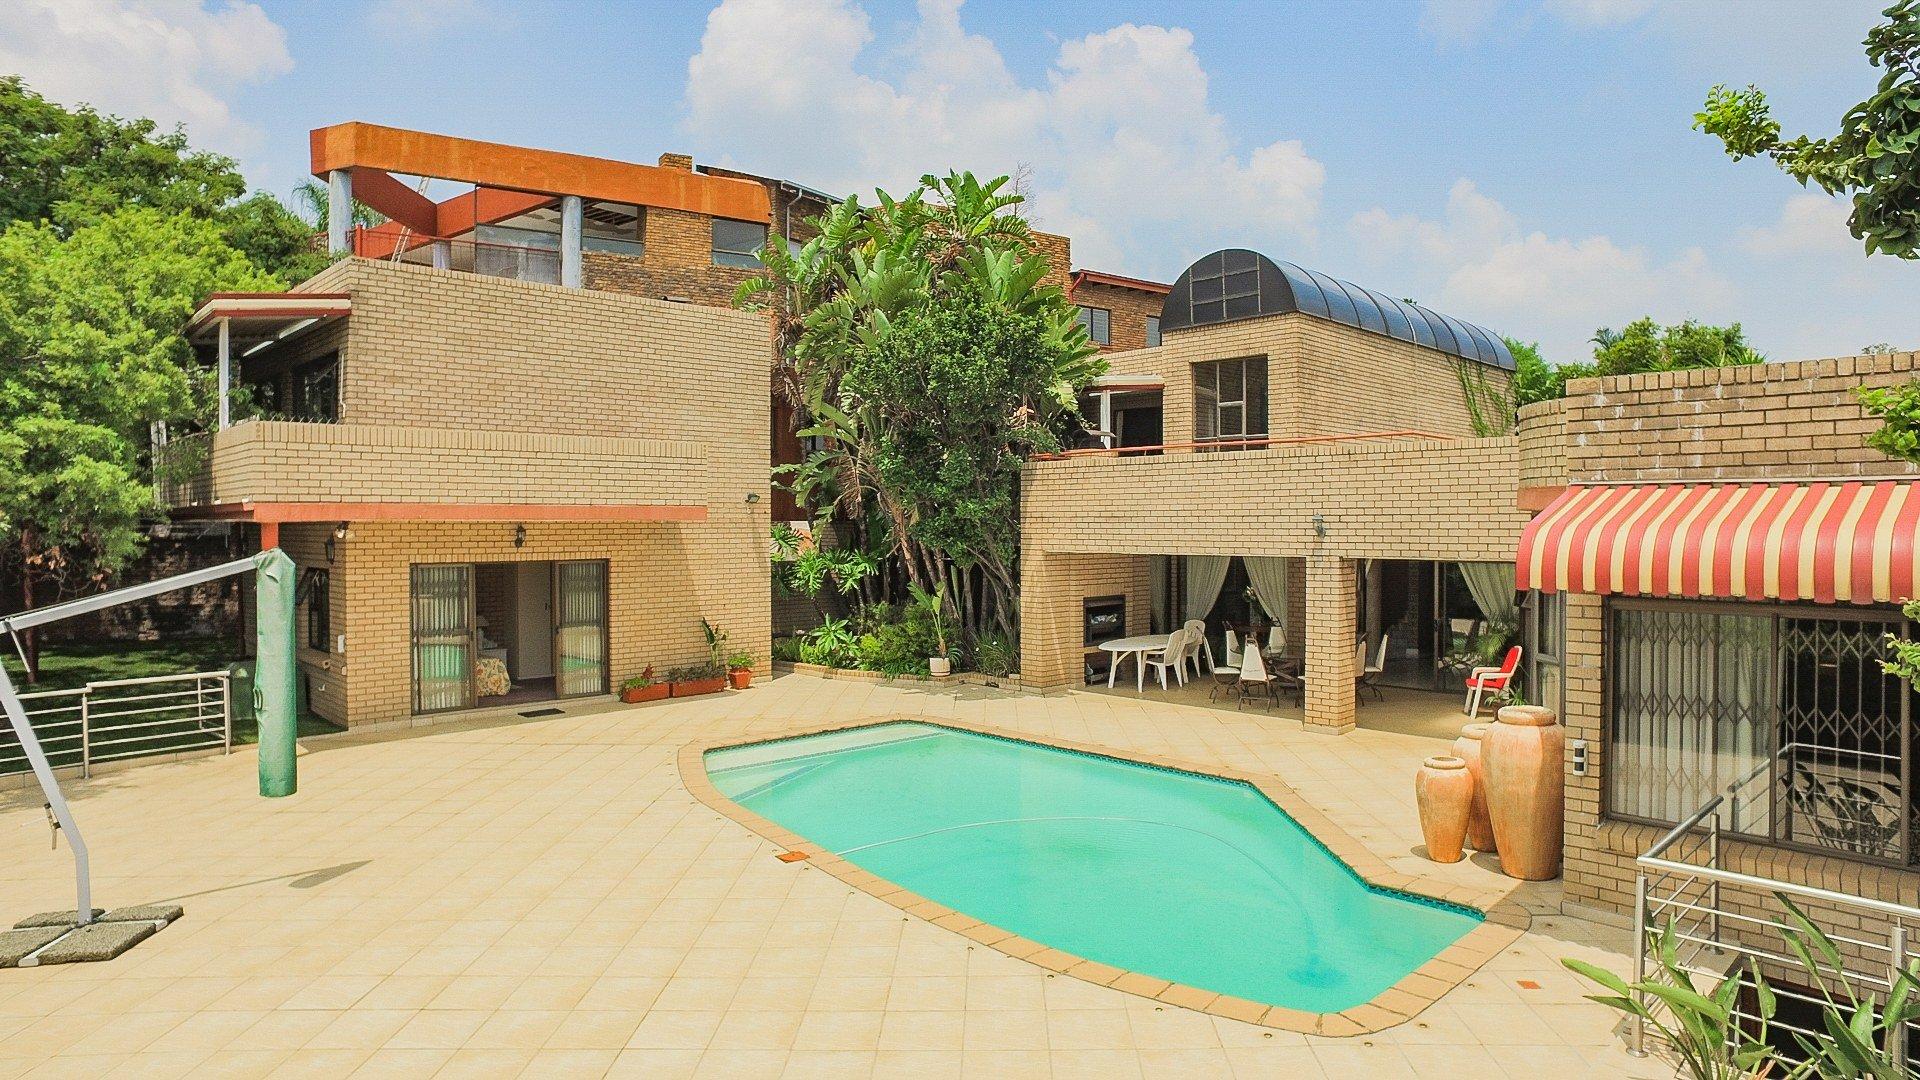 Johannesburg, Glenvista Property  | Houses For Sale Glenvista, Glenvista, House 4 bedrooms property for sale Price:3,800,000